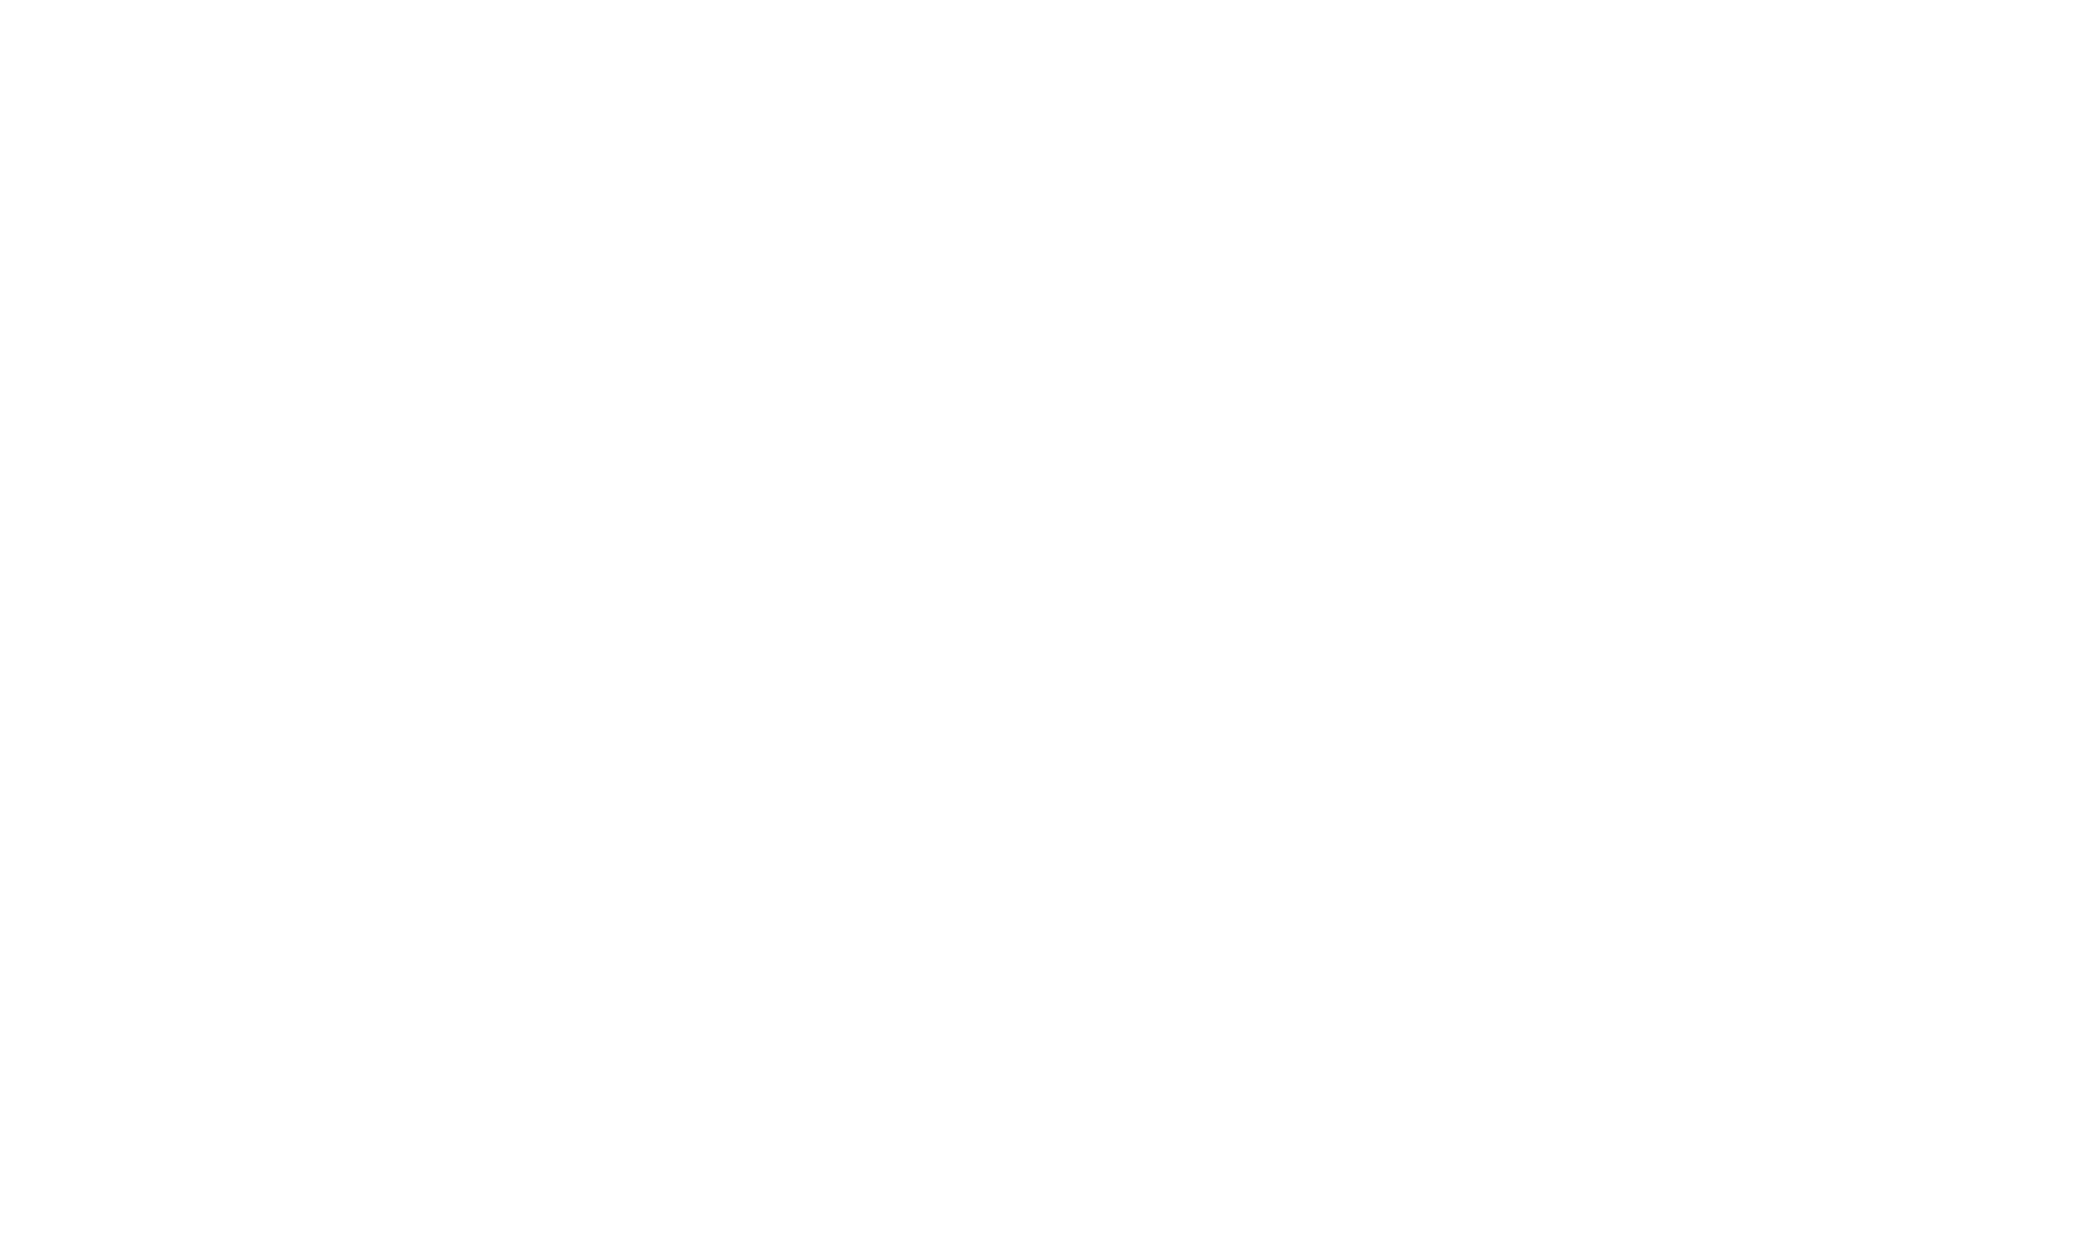 Value Capture White Logo Transparent